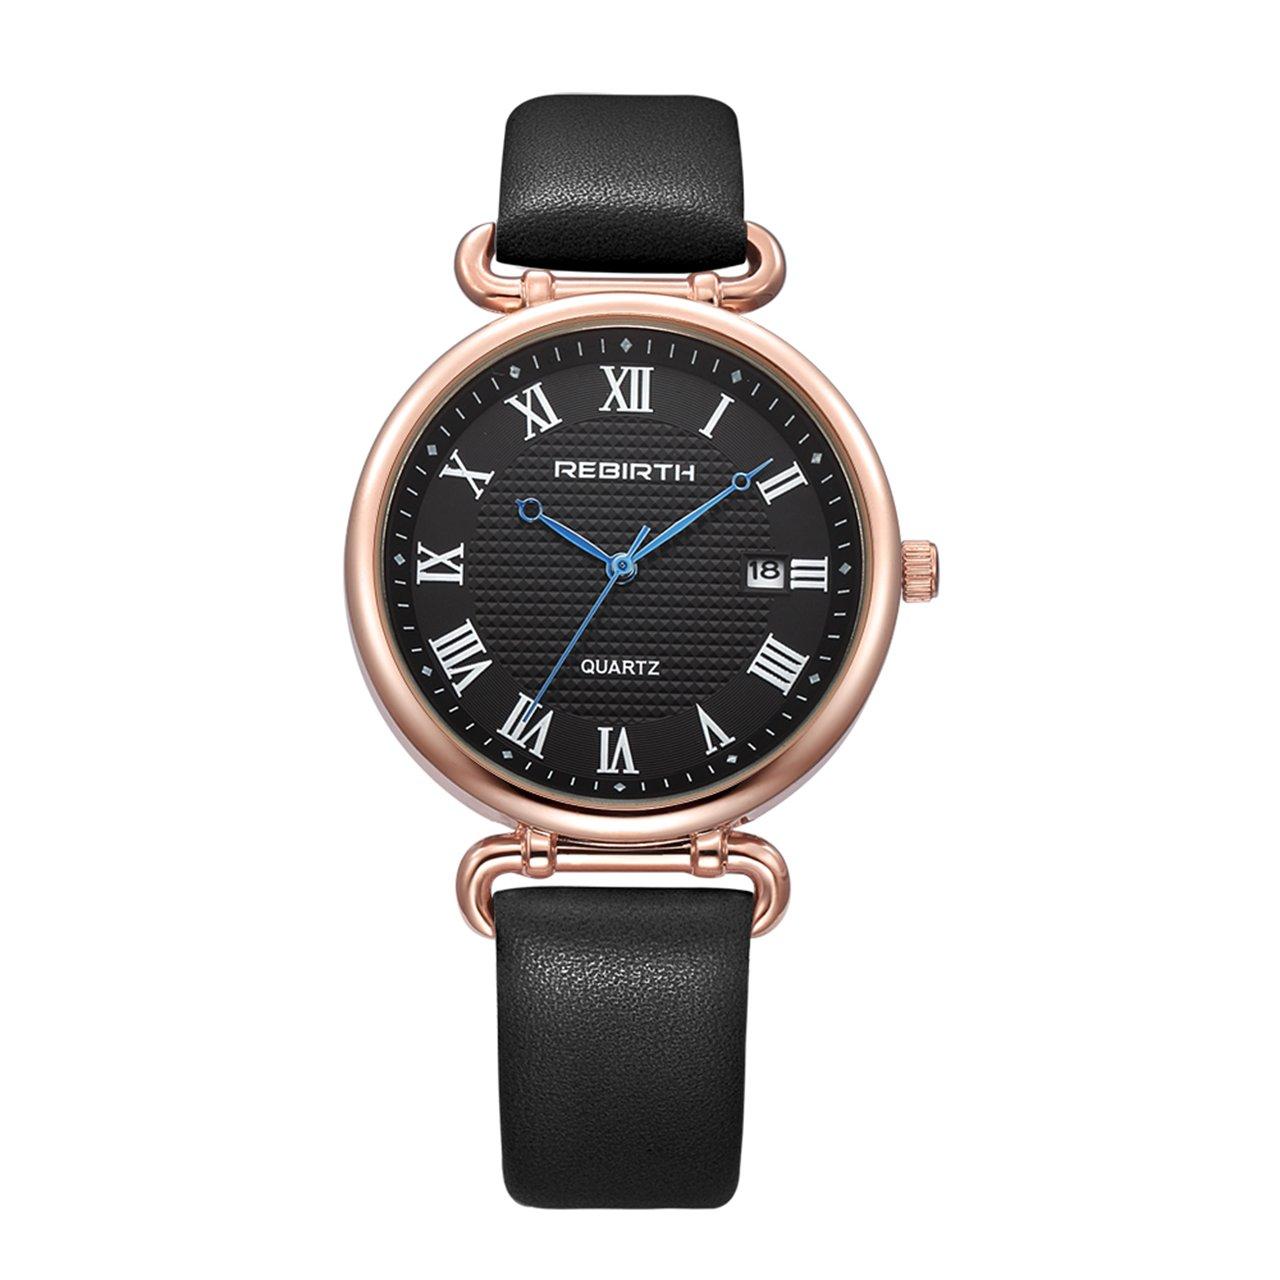 Top Plaza Women Elegant Simple Rose Gold Tone Bracelet Watch Japanese Movement Roman Numerals PU Leather Waterproof Analog Quartz Watch(Black #2)